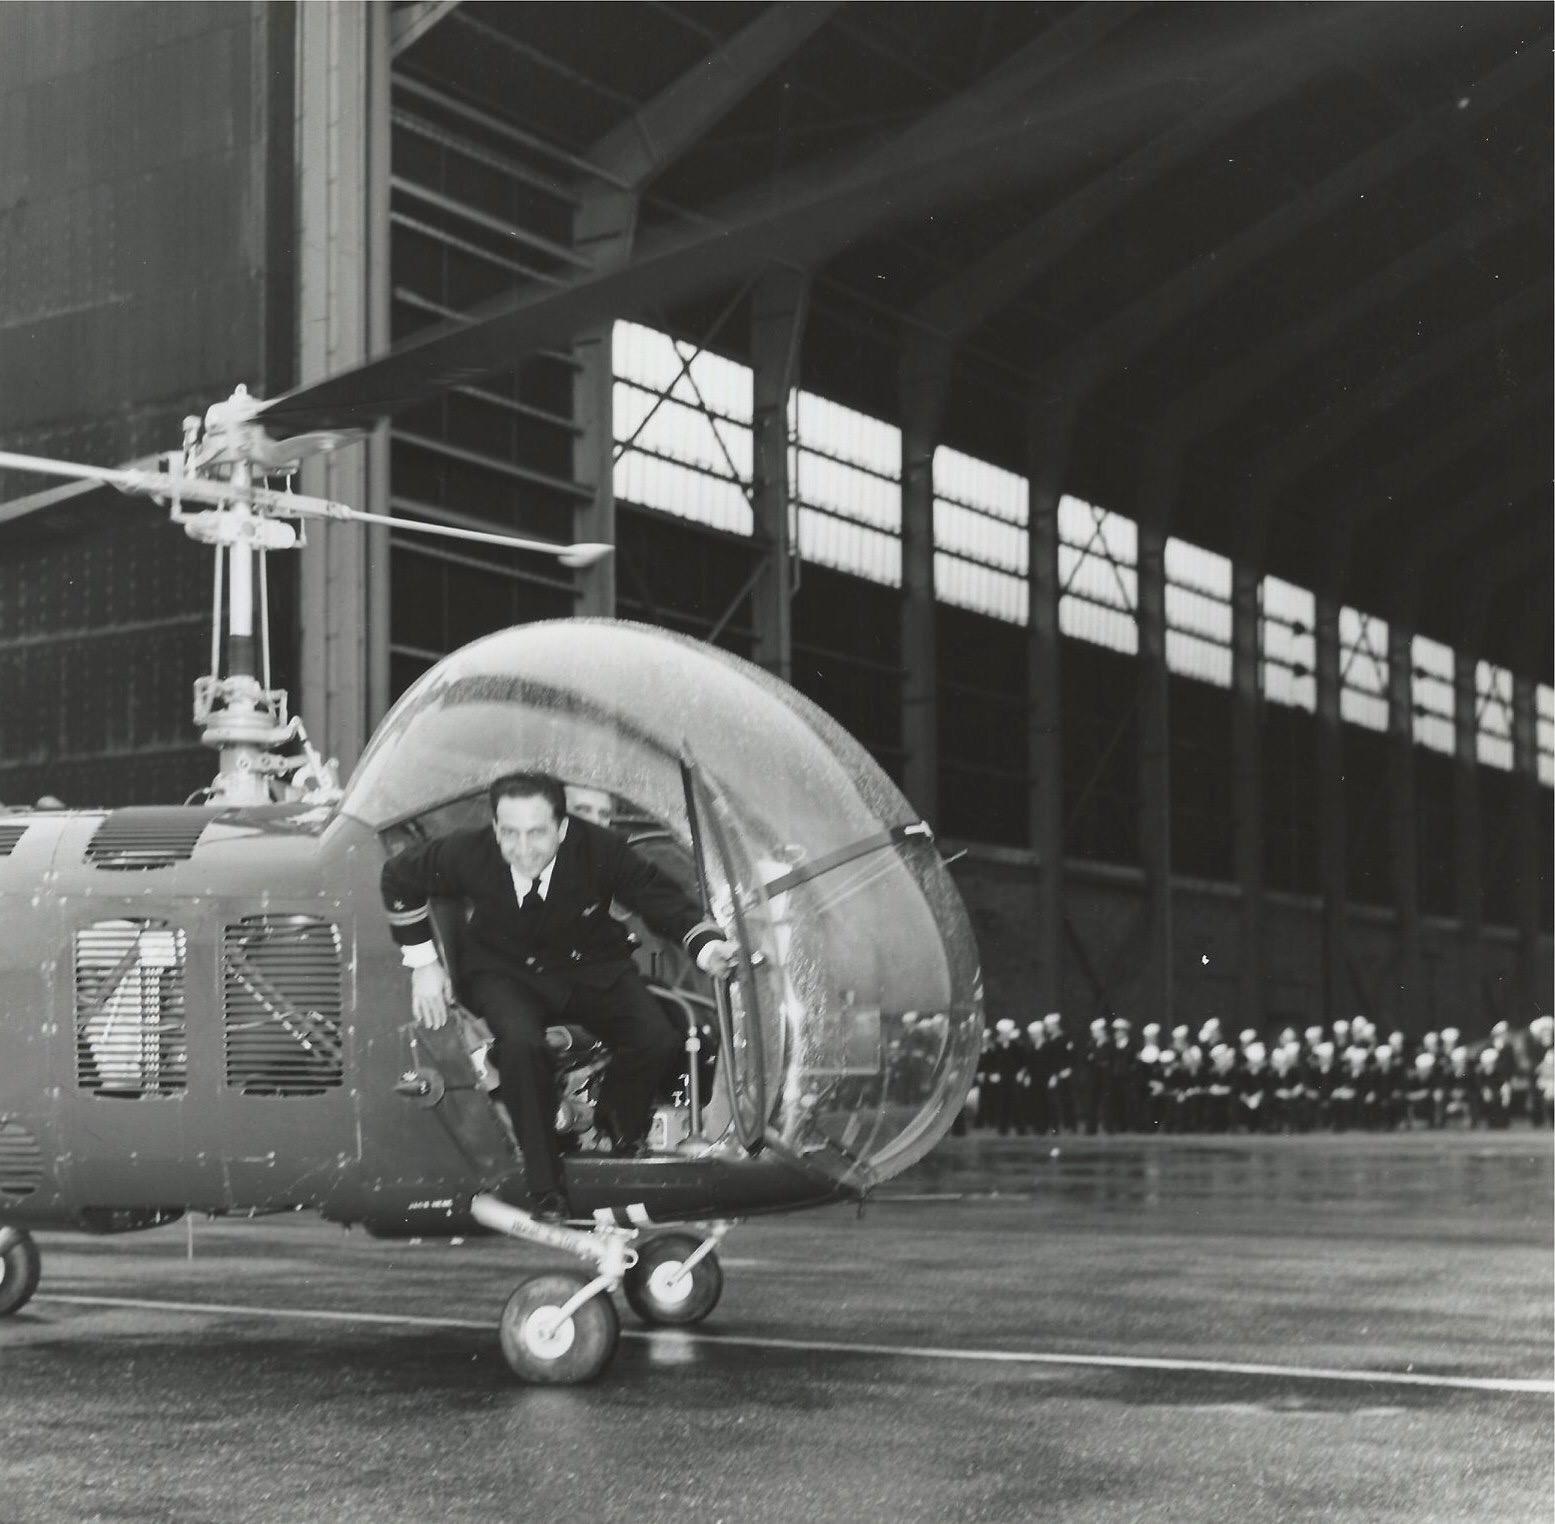 LT Joe Rullo (helicopter pilot #17),